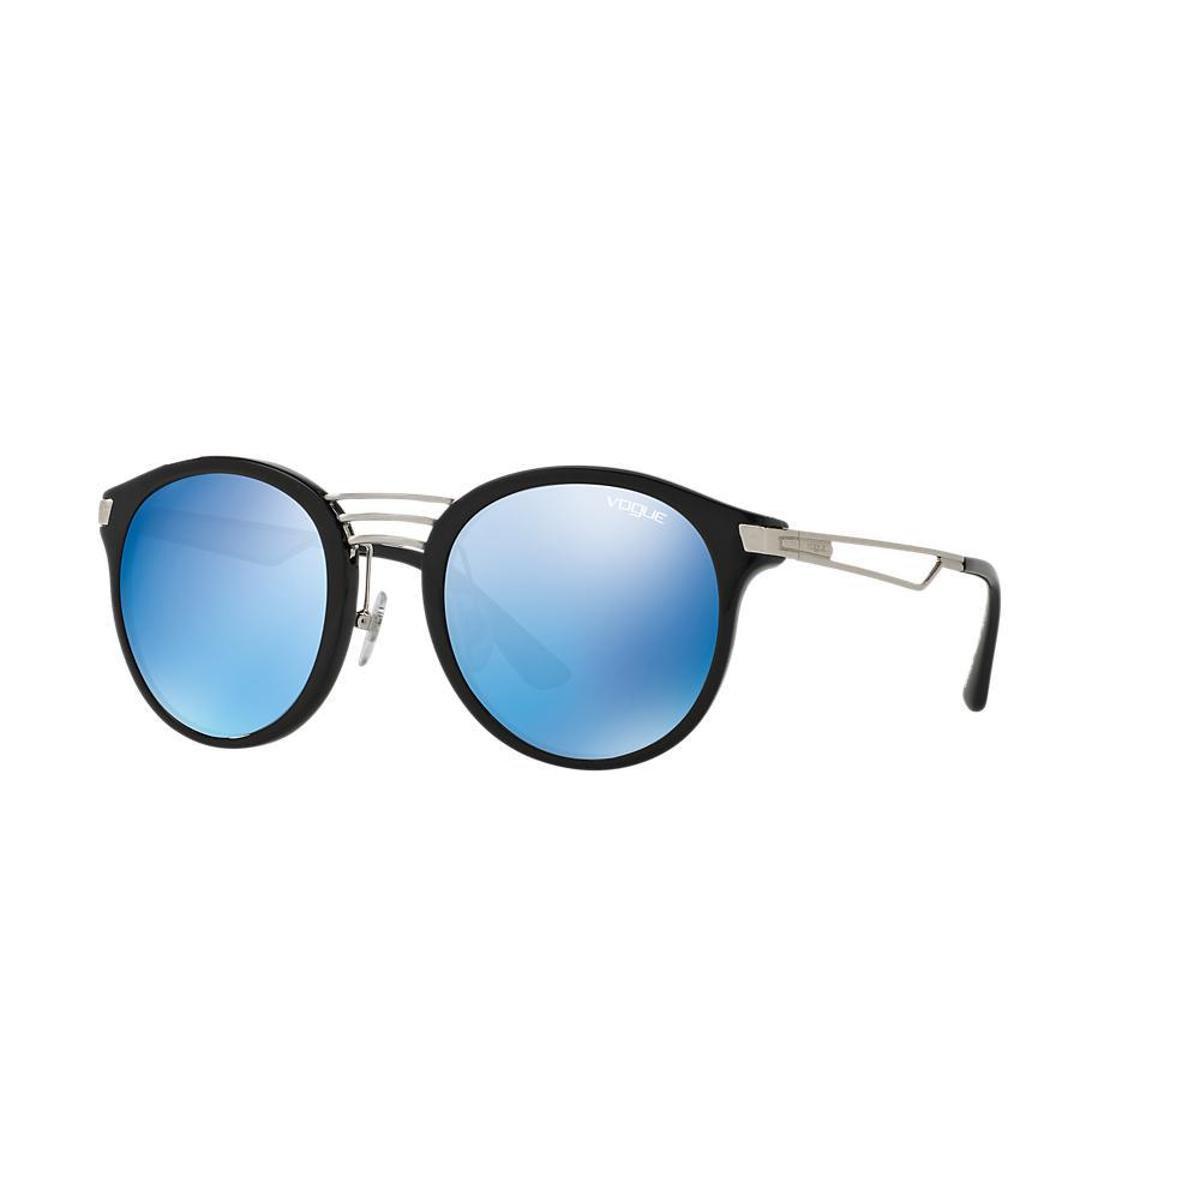 Óculos de Sol Vogue Redondo VO5132S Feminino - Compre Agora   Zattini 48fc06dd23